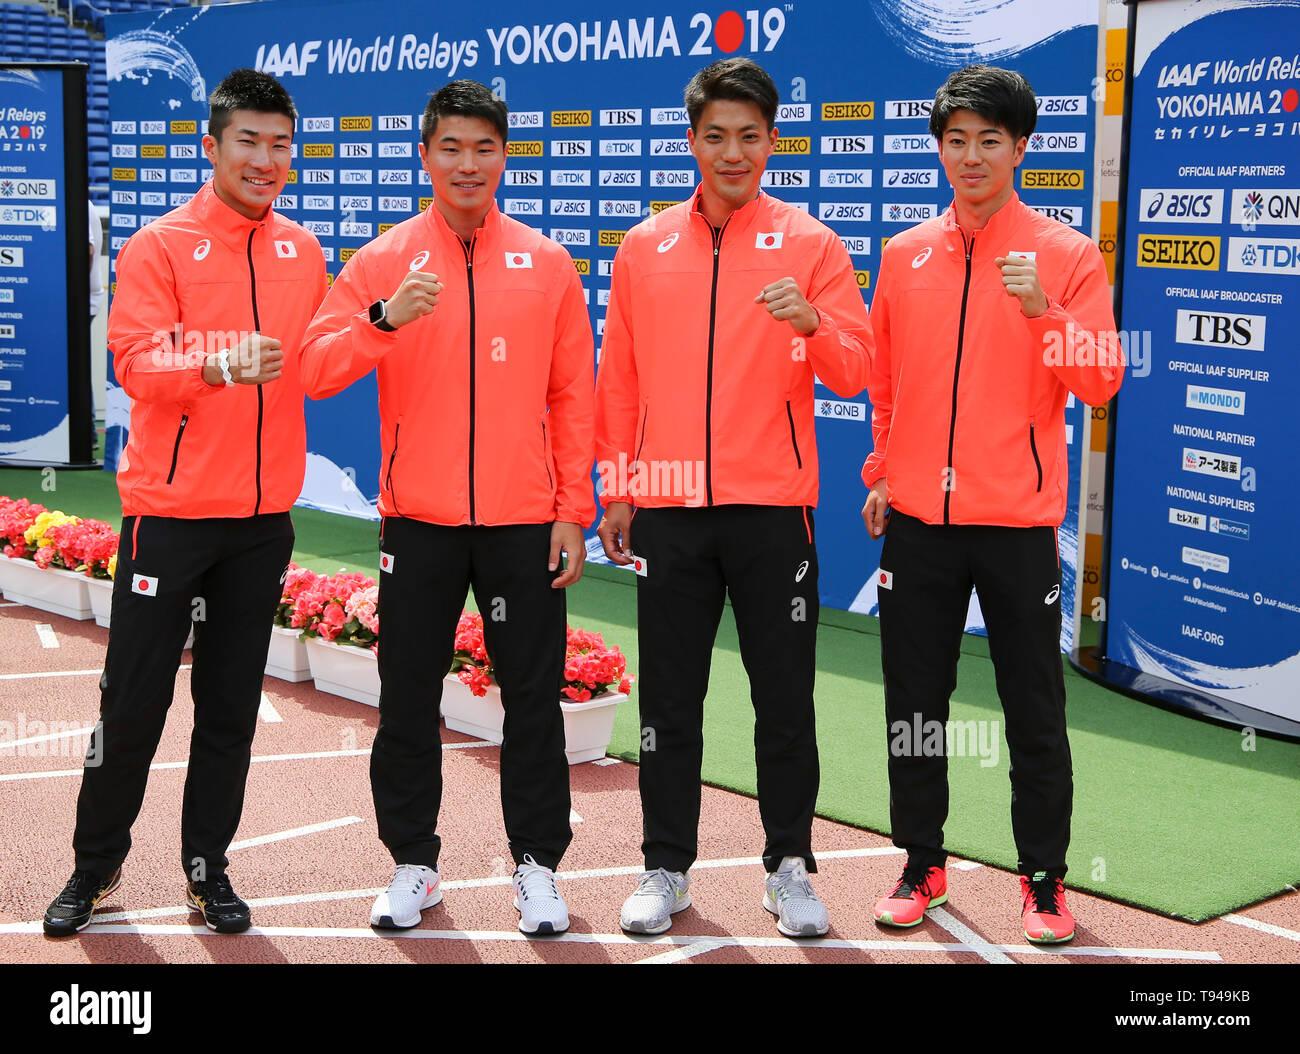 YOKOHAMA, JAPAN - MAY 10: Japan's 4x100m team (Yoshihide Kiryu, Ryota Yamagata, Yuki Koike, Shuhei Tada) during the official press conference of the 2019 IAAF World Relay Championships at the Nissan Stadium on May 10, 2019 in Yokohama, Japan. (Photo by Roger Sedres for the IAAF) - Stock Image